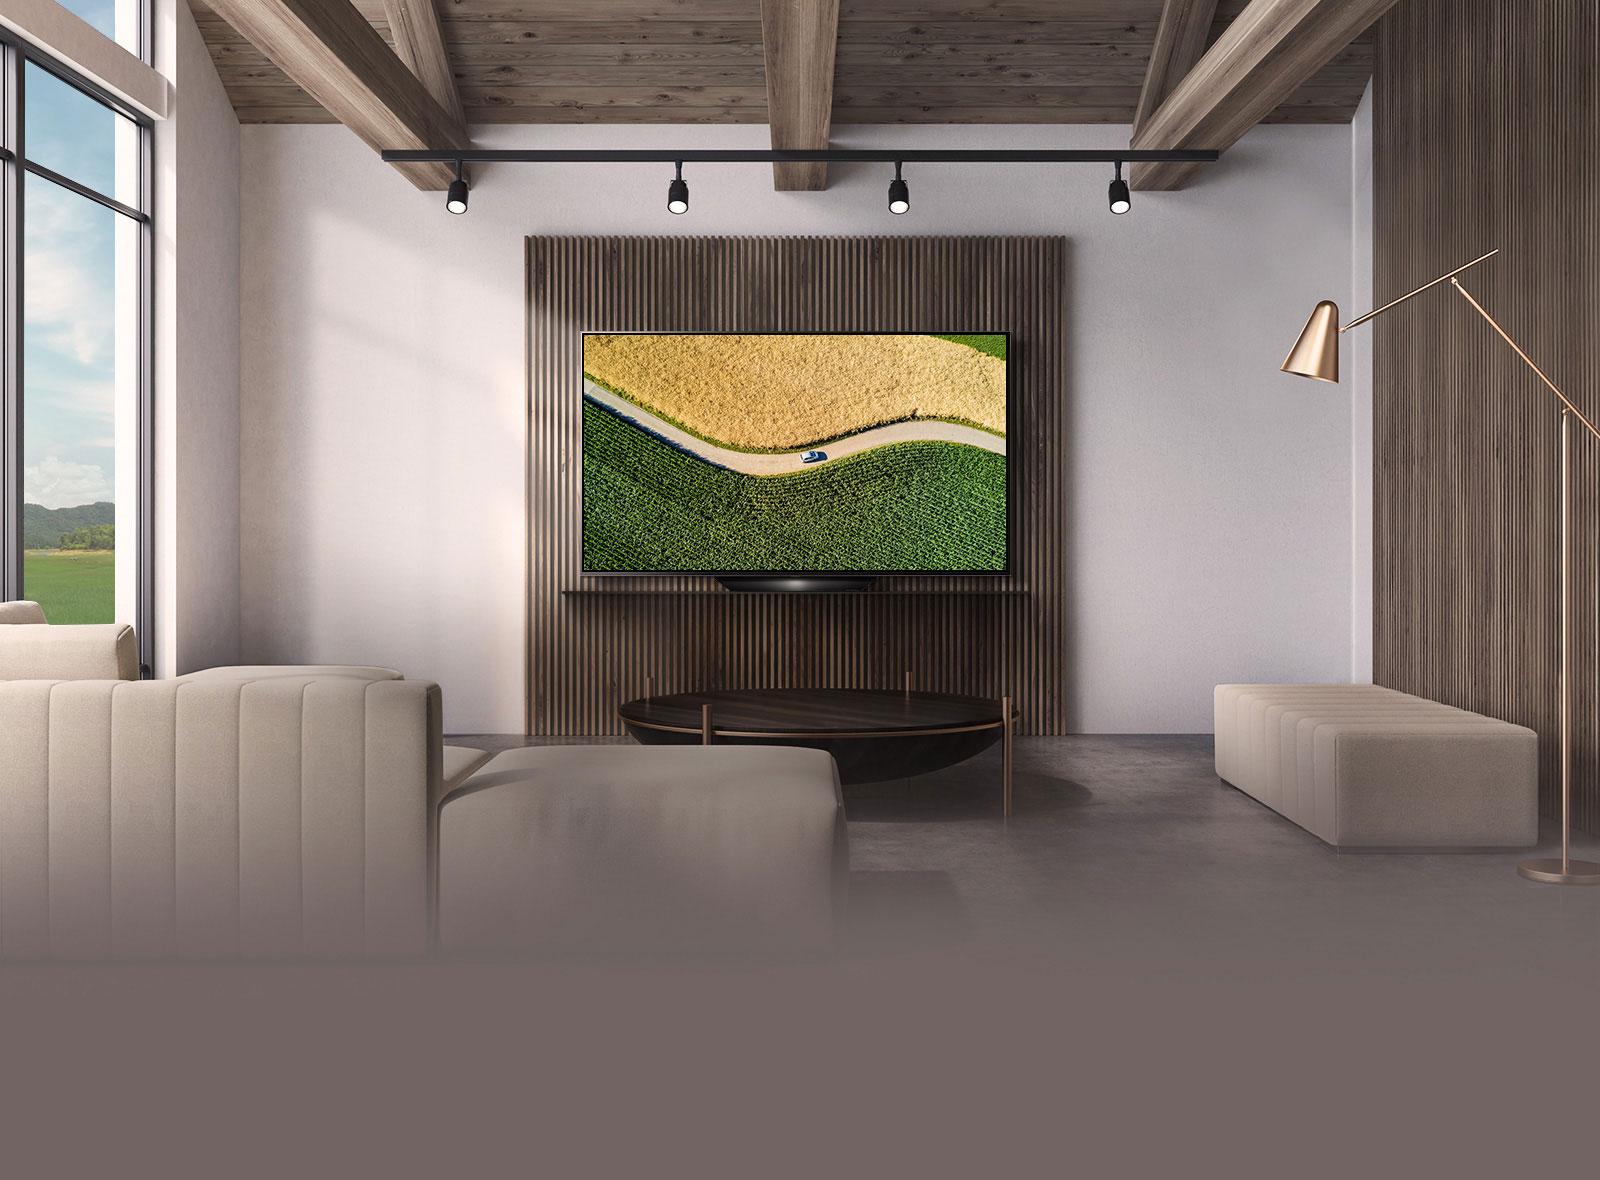 LG Sleek Design OLED TV